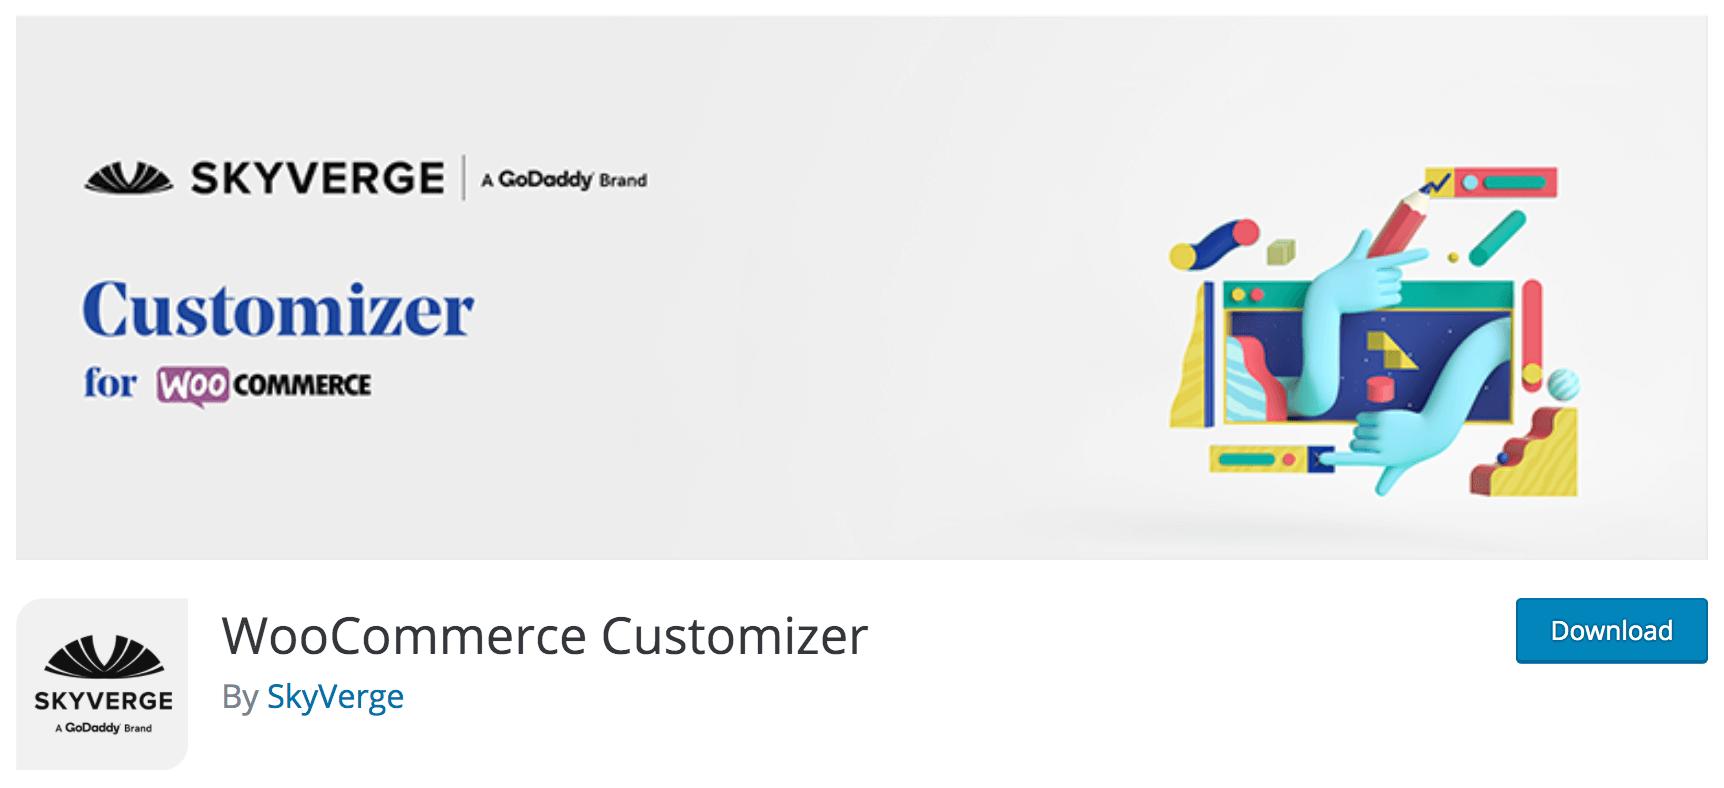 WooCommerce Customizer by SkyVerge